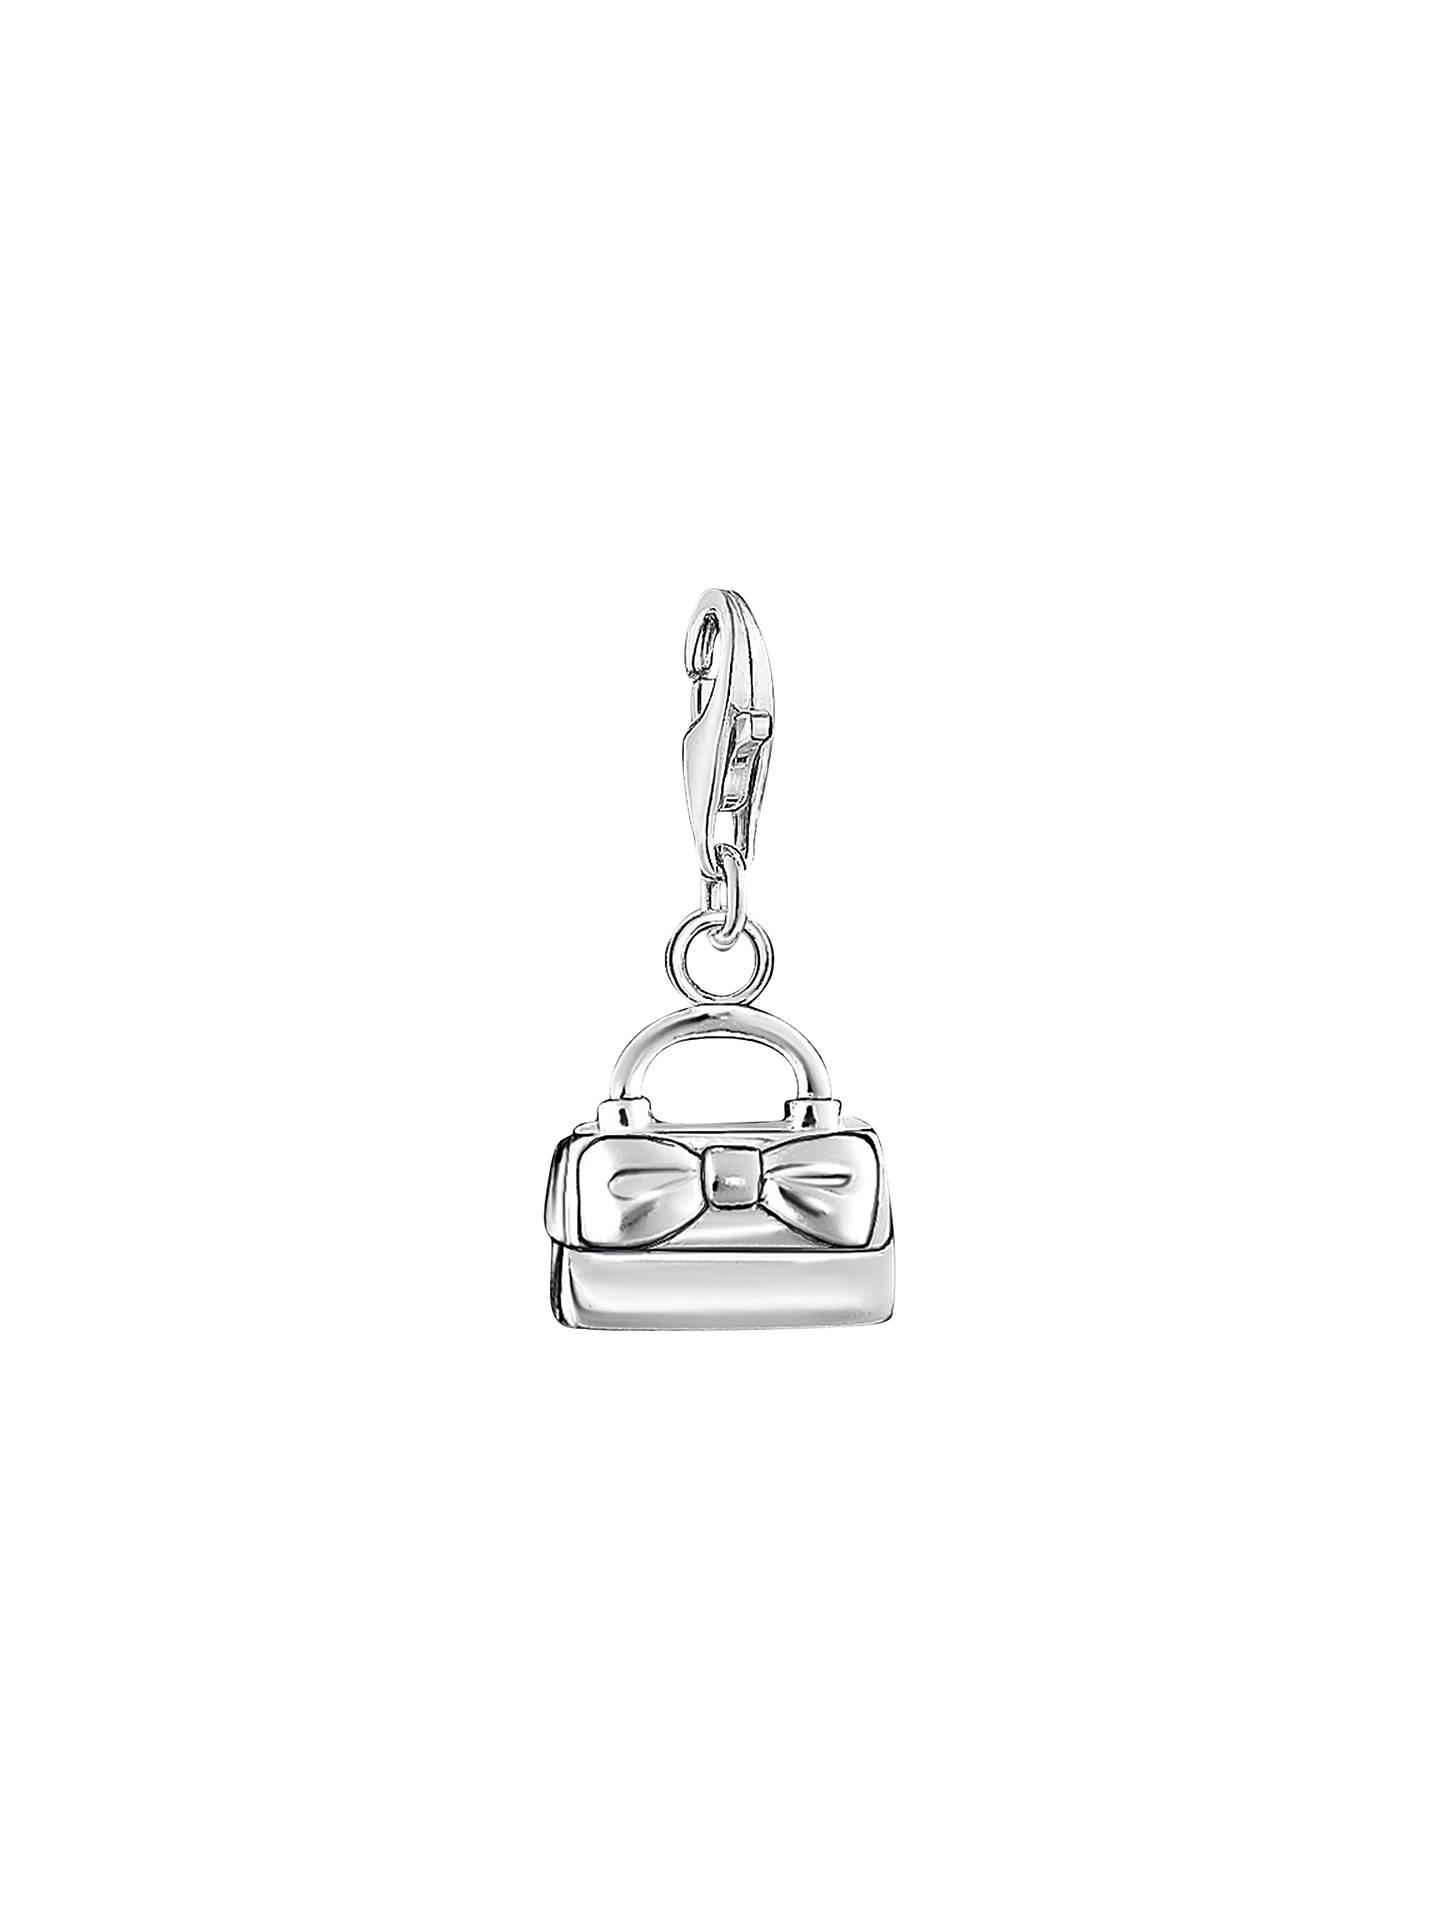 Thomas Sabo Charm Club Handbag Silver Online At Johnlewis